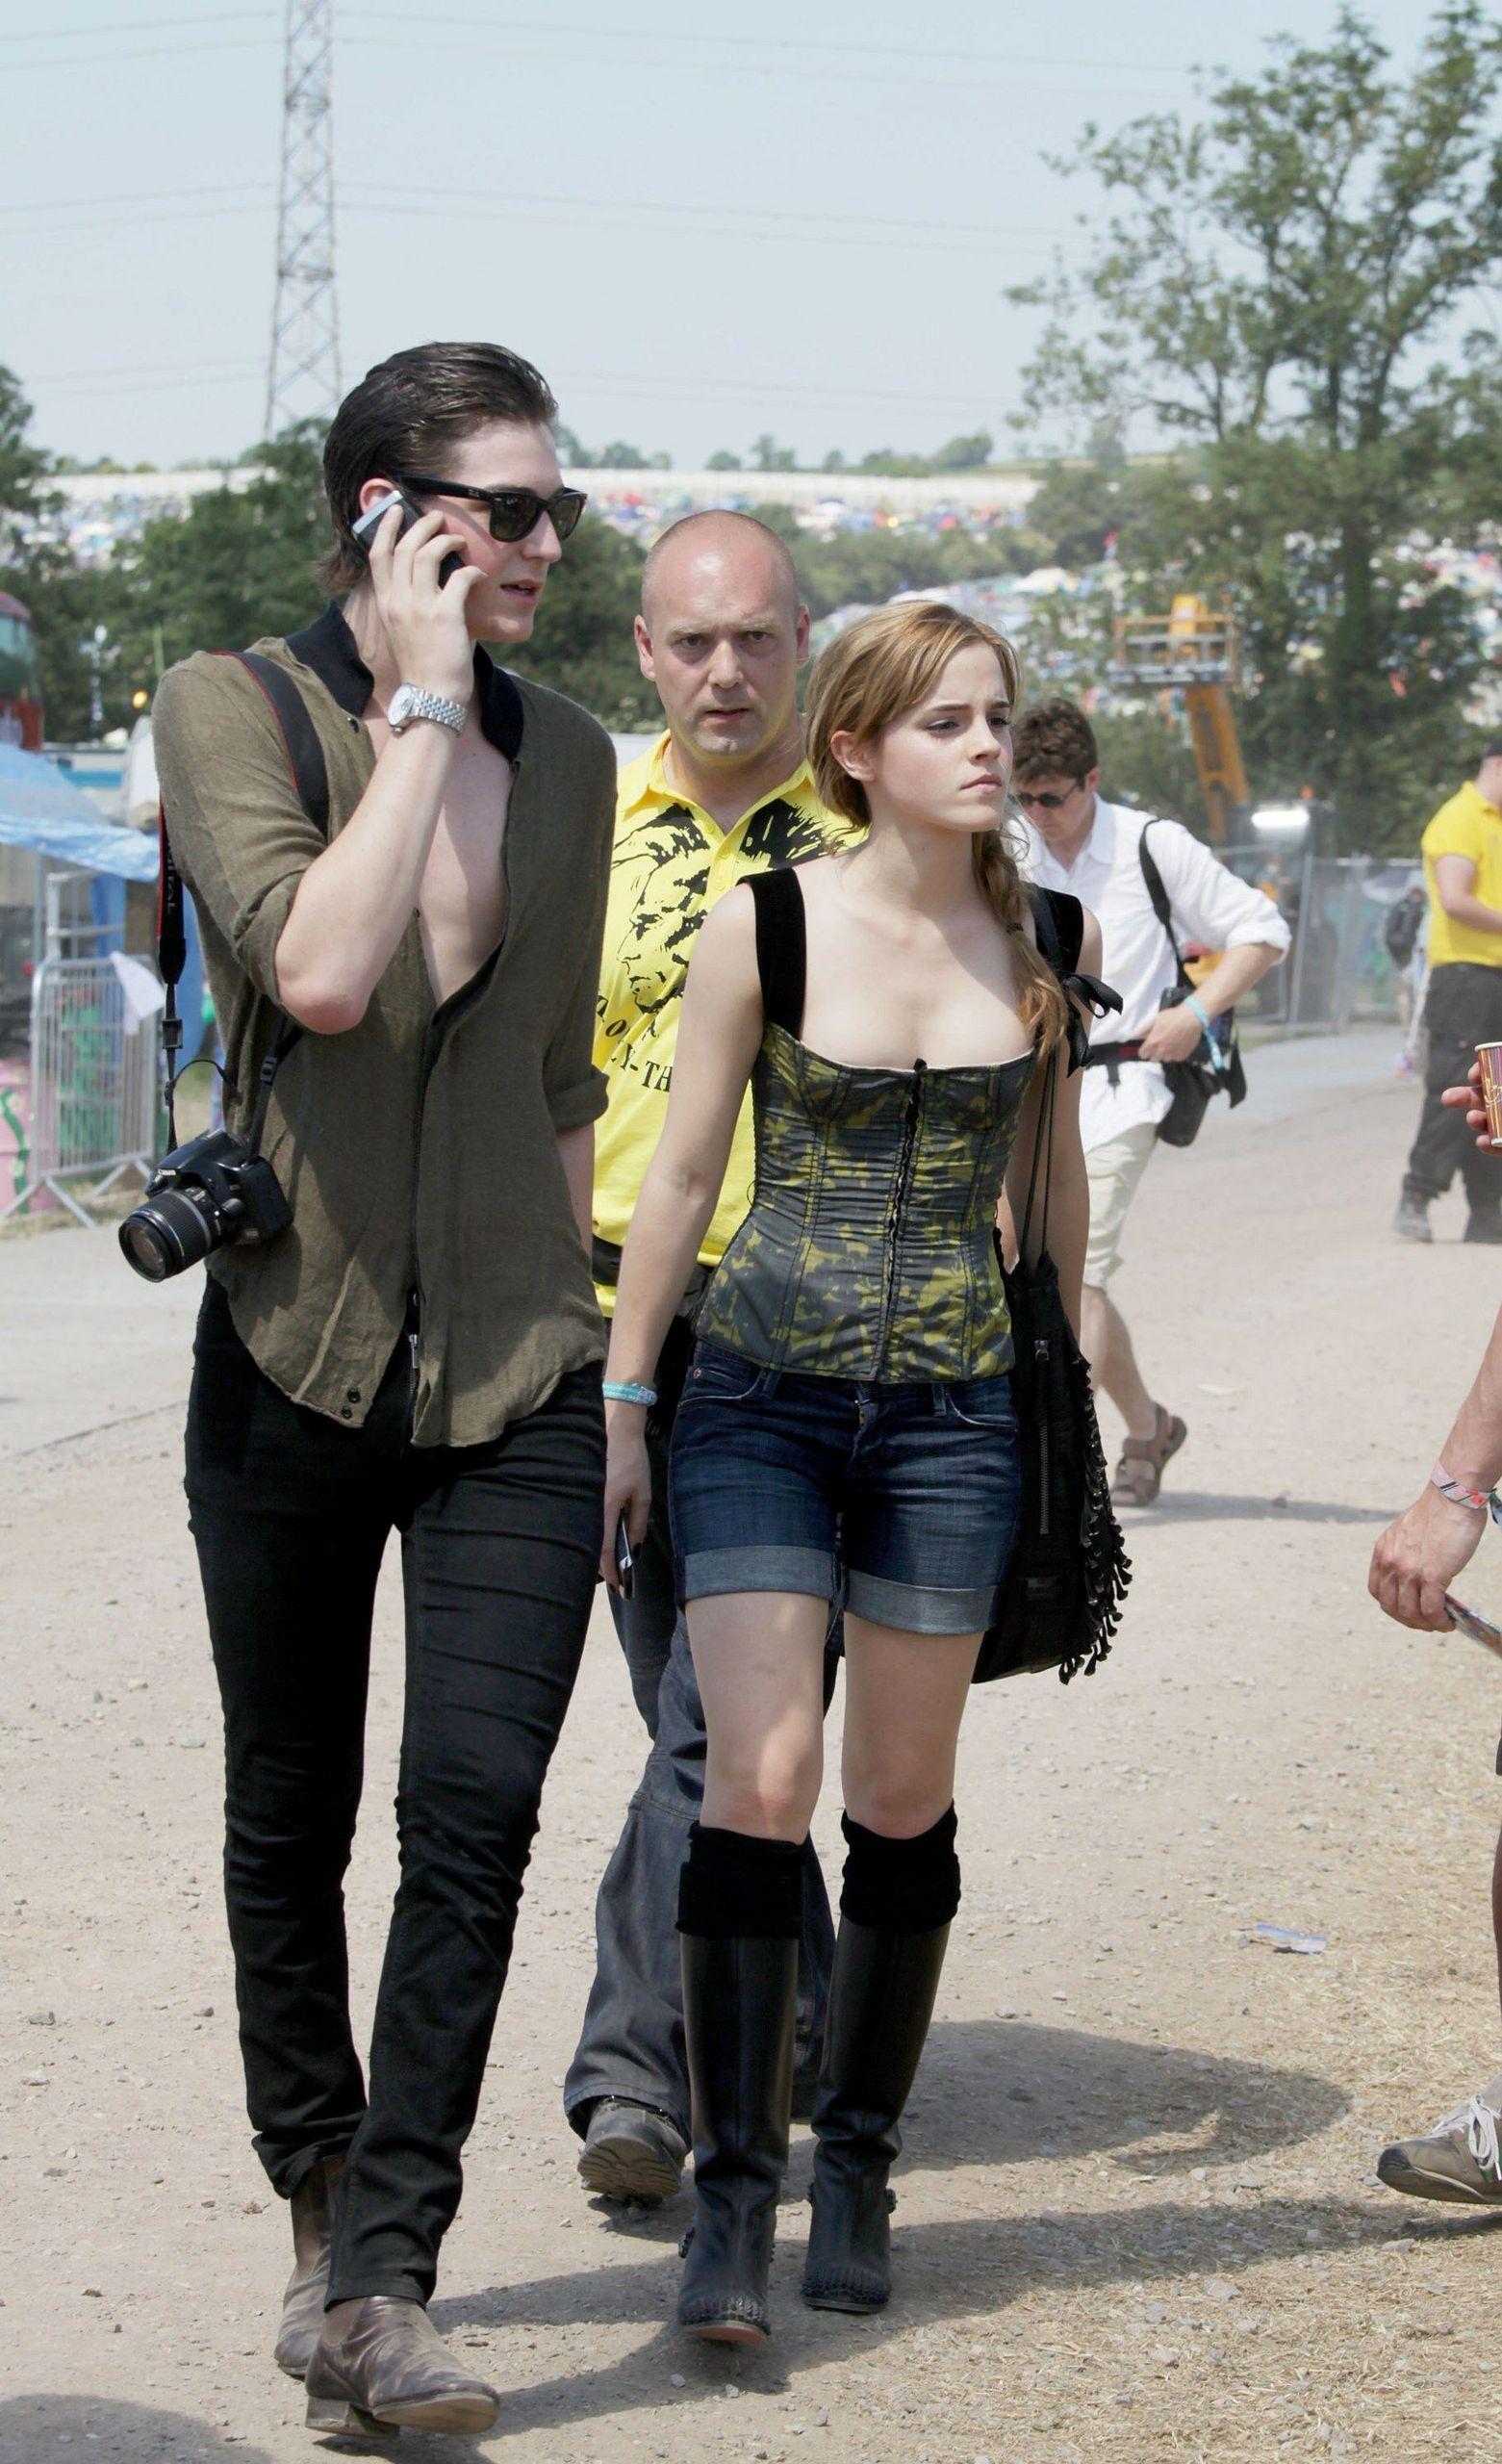 2010 Glastonbury muziek Festival in Somerset, England (25.06.10) [HQ]